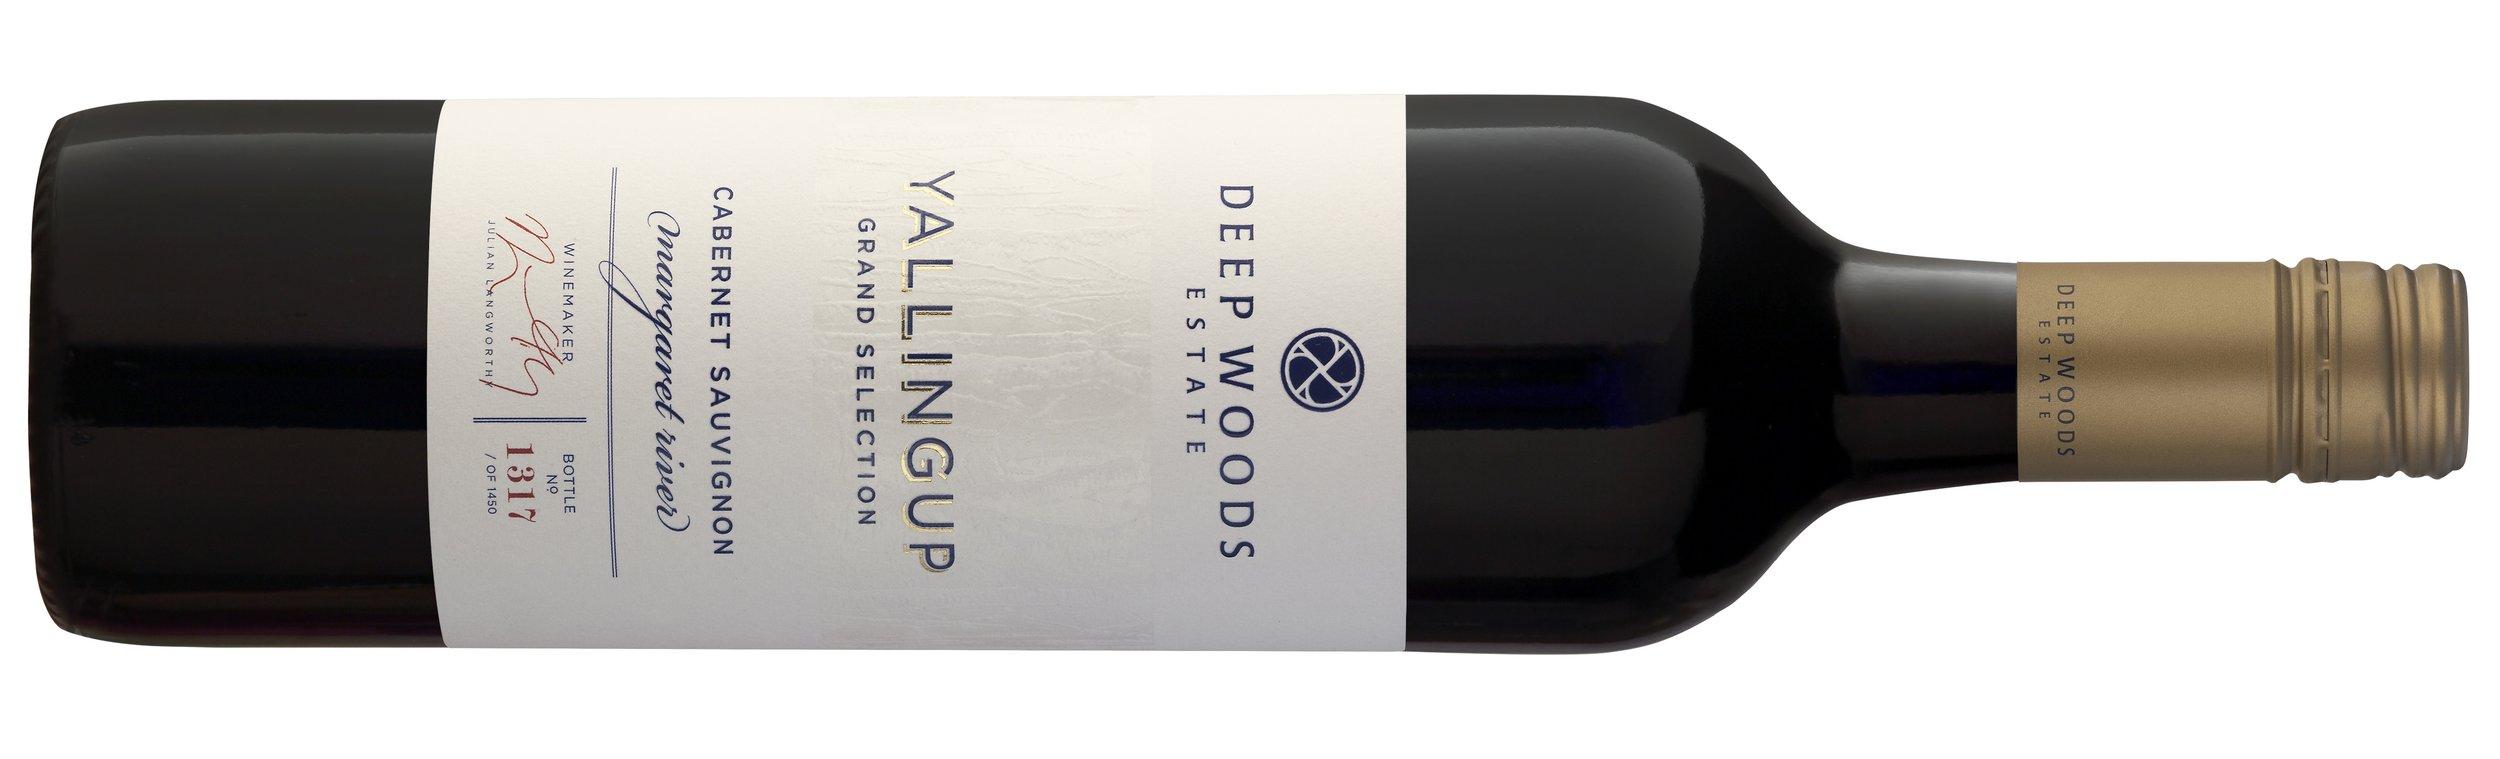 2014 Deep Woods Estate, Grand Selection Yallingup, Cabernet Sauvignon